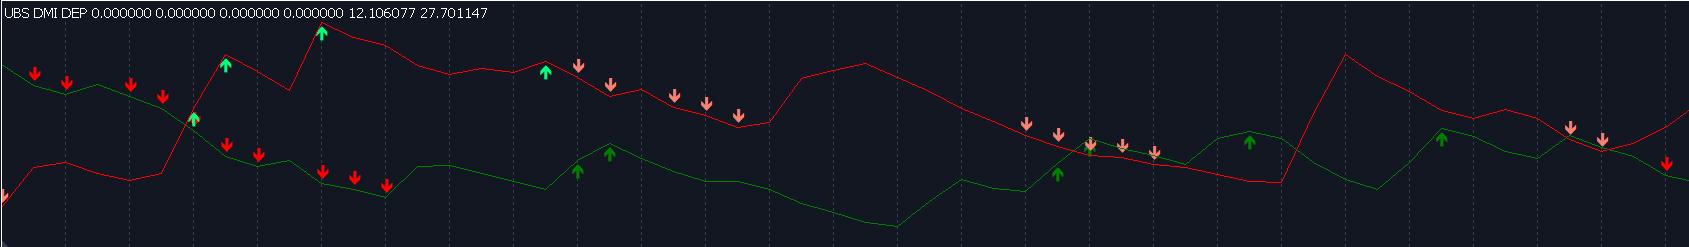 Directional Movement Index DMI Indicator MetaTrader Ultimate Breakout